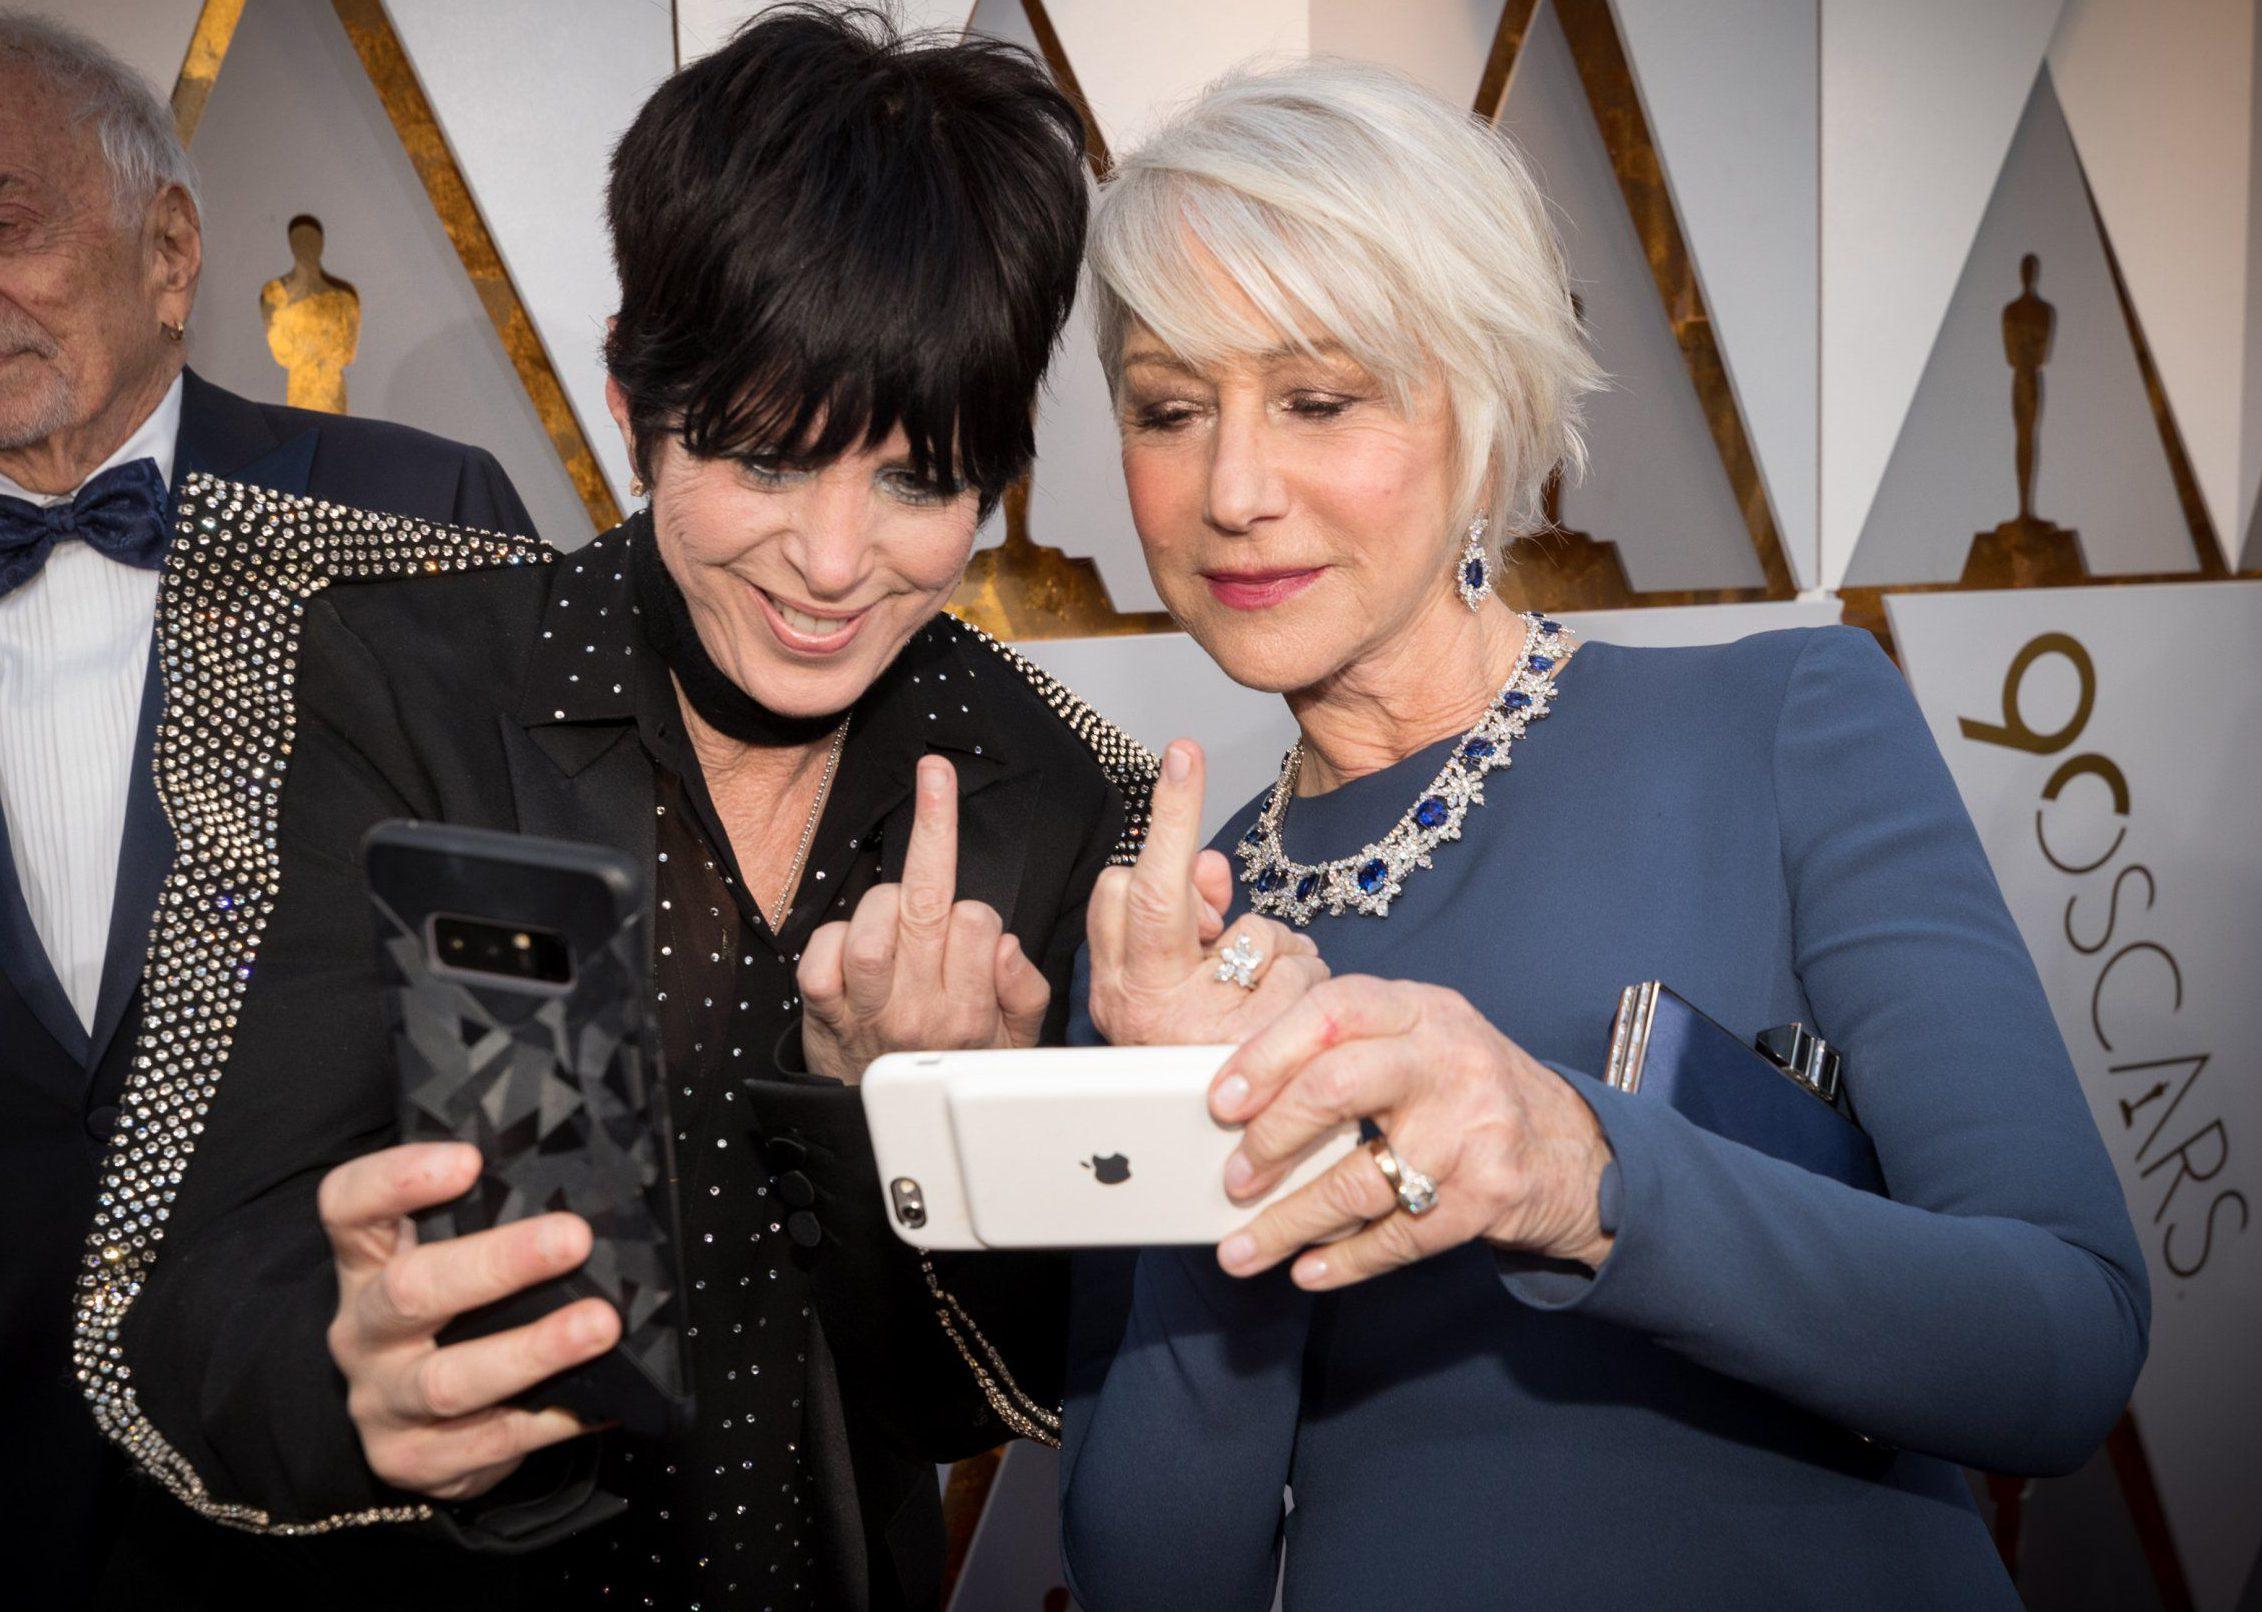 Helen Mirren flips the bird in badass Oscars selfie with Diane Warren